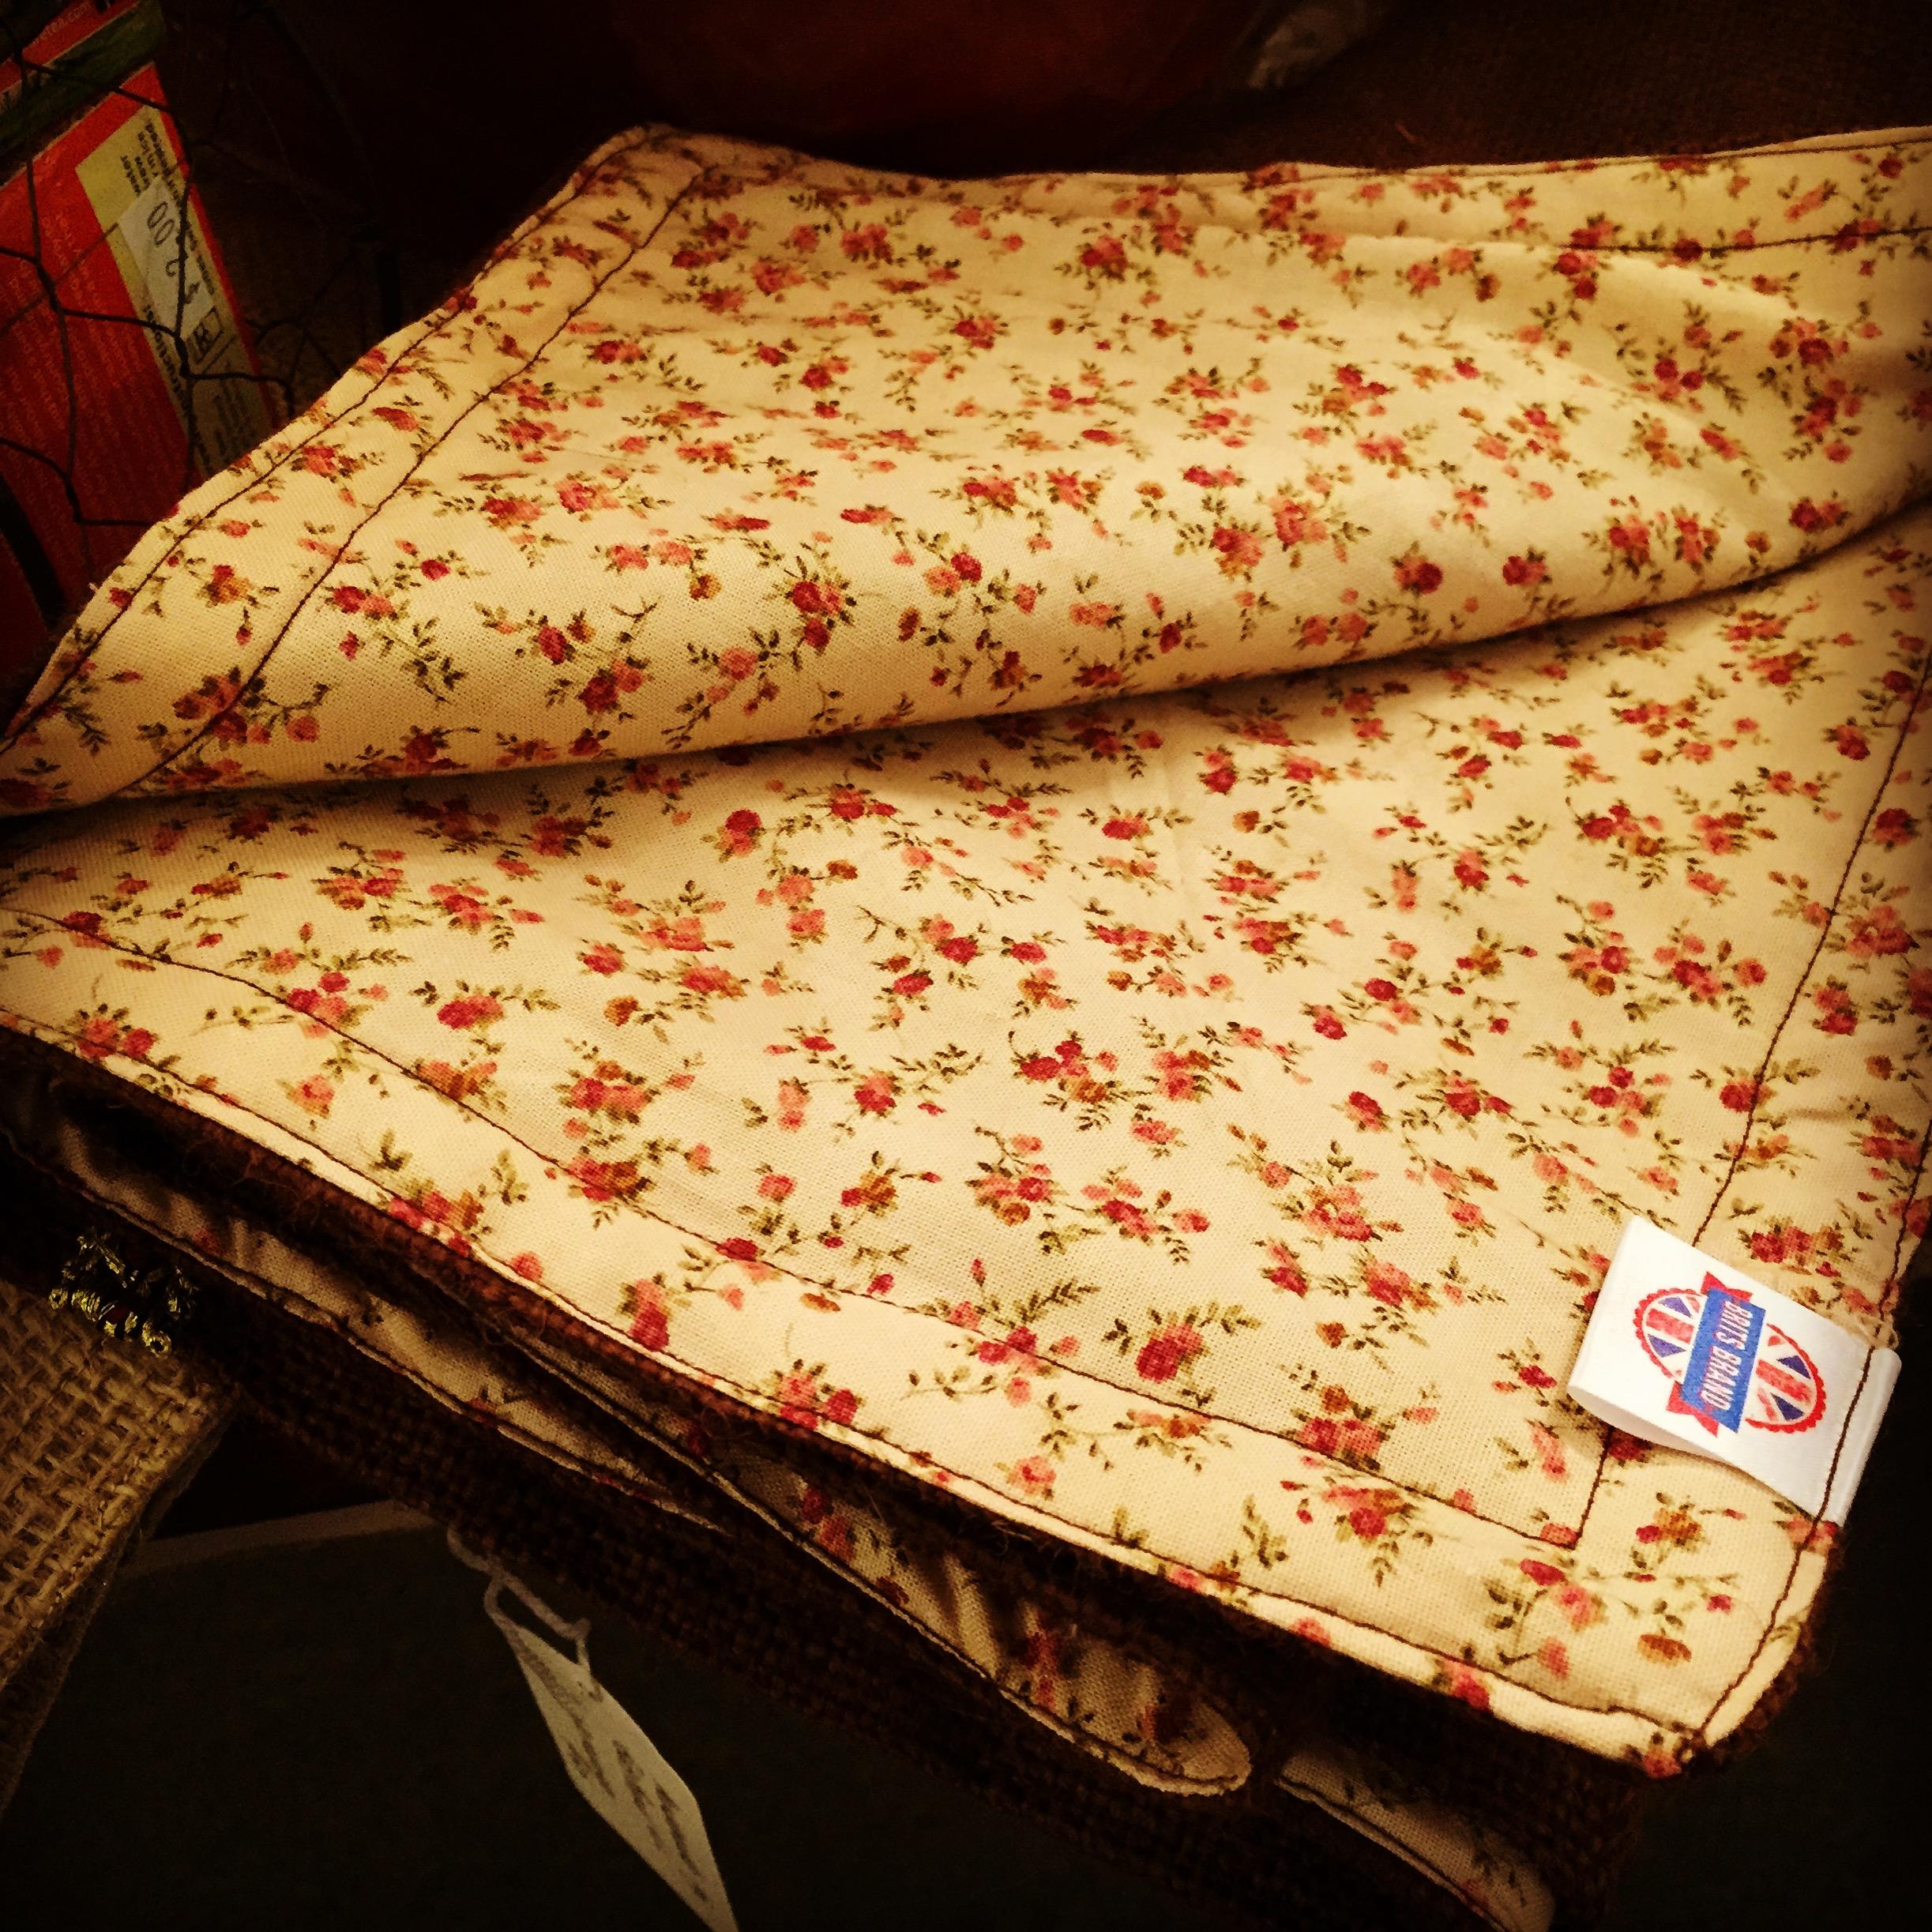 Beautiful handmade table runners and mats